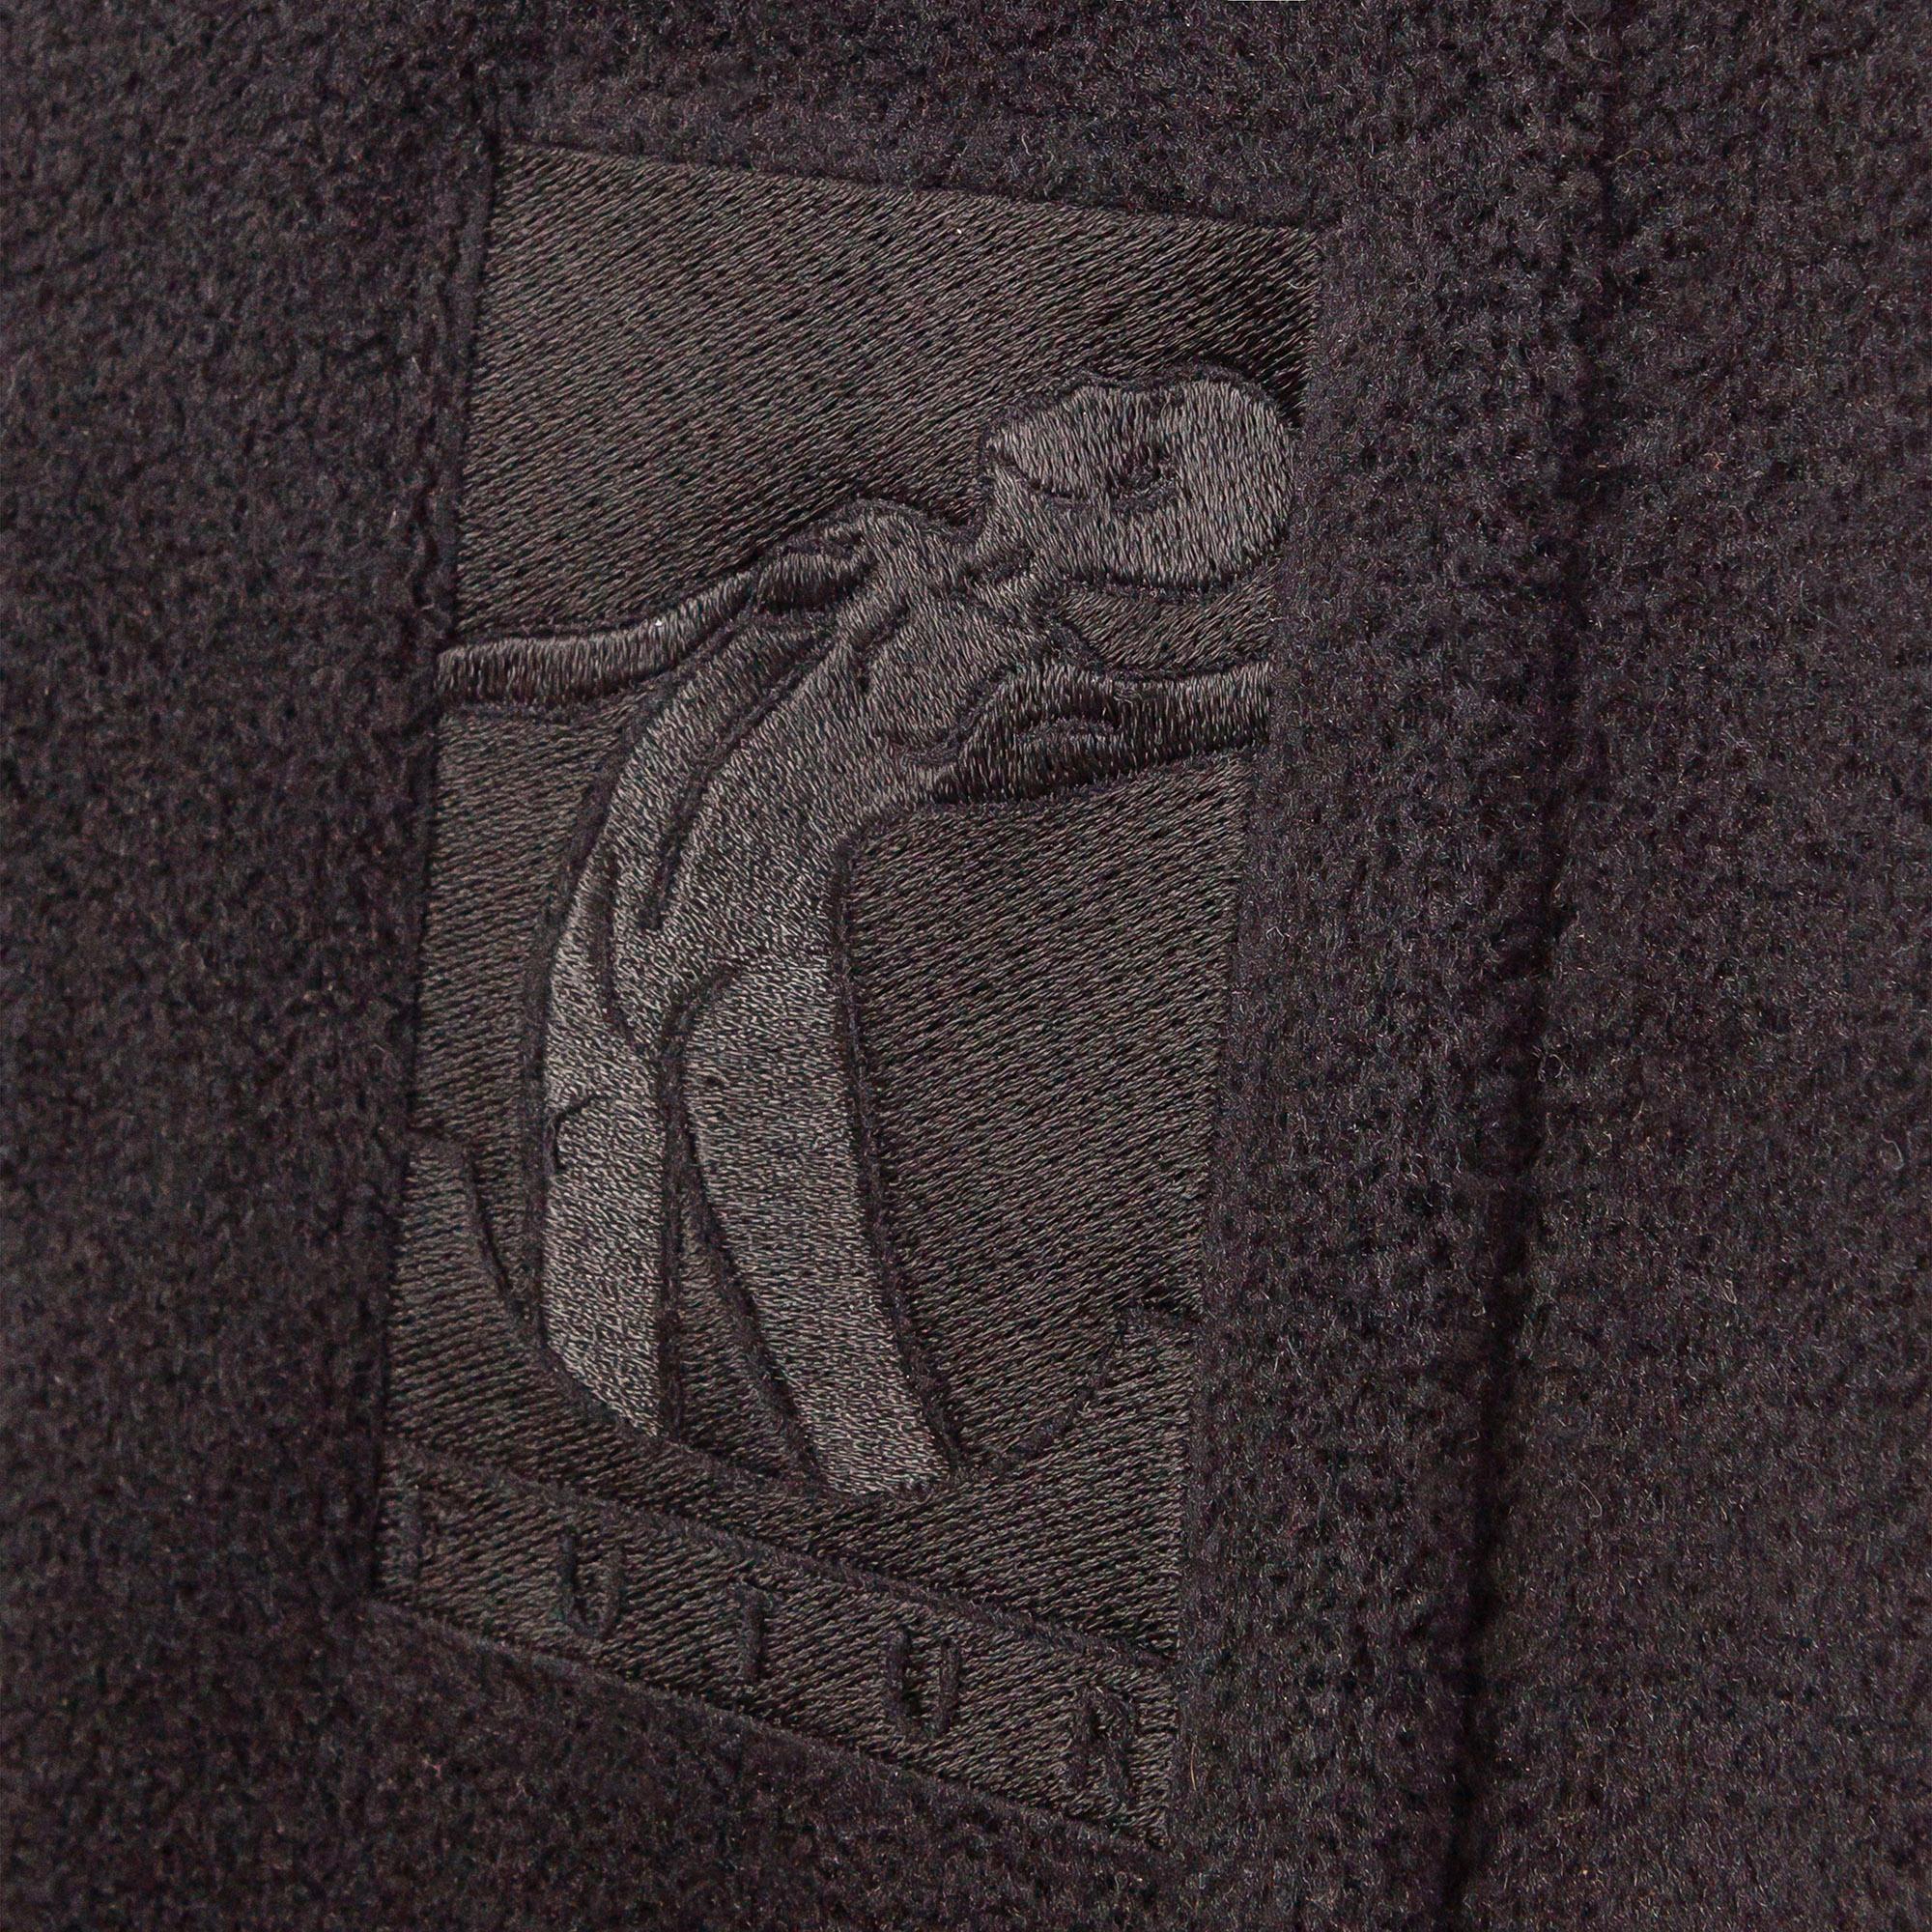 HELLY HANSEN X FUTUR - PANTS - DETAIL 2